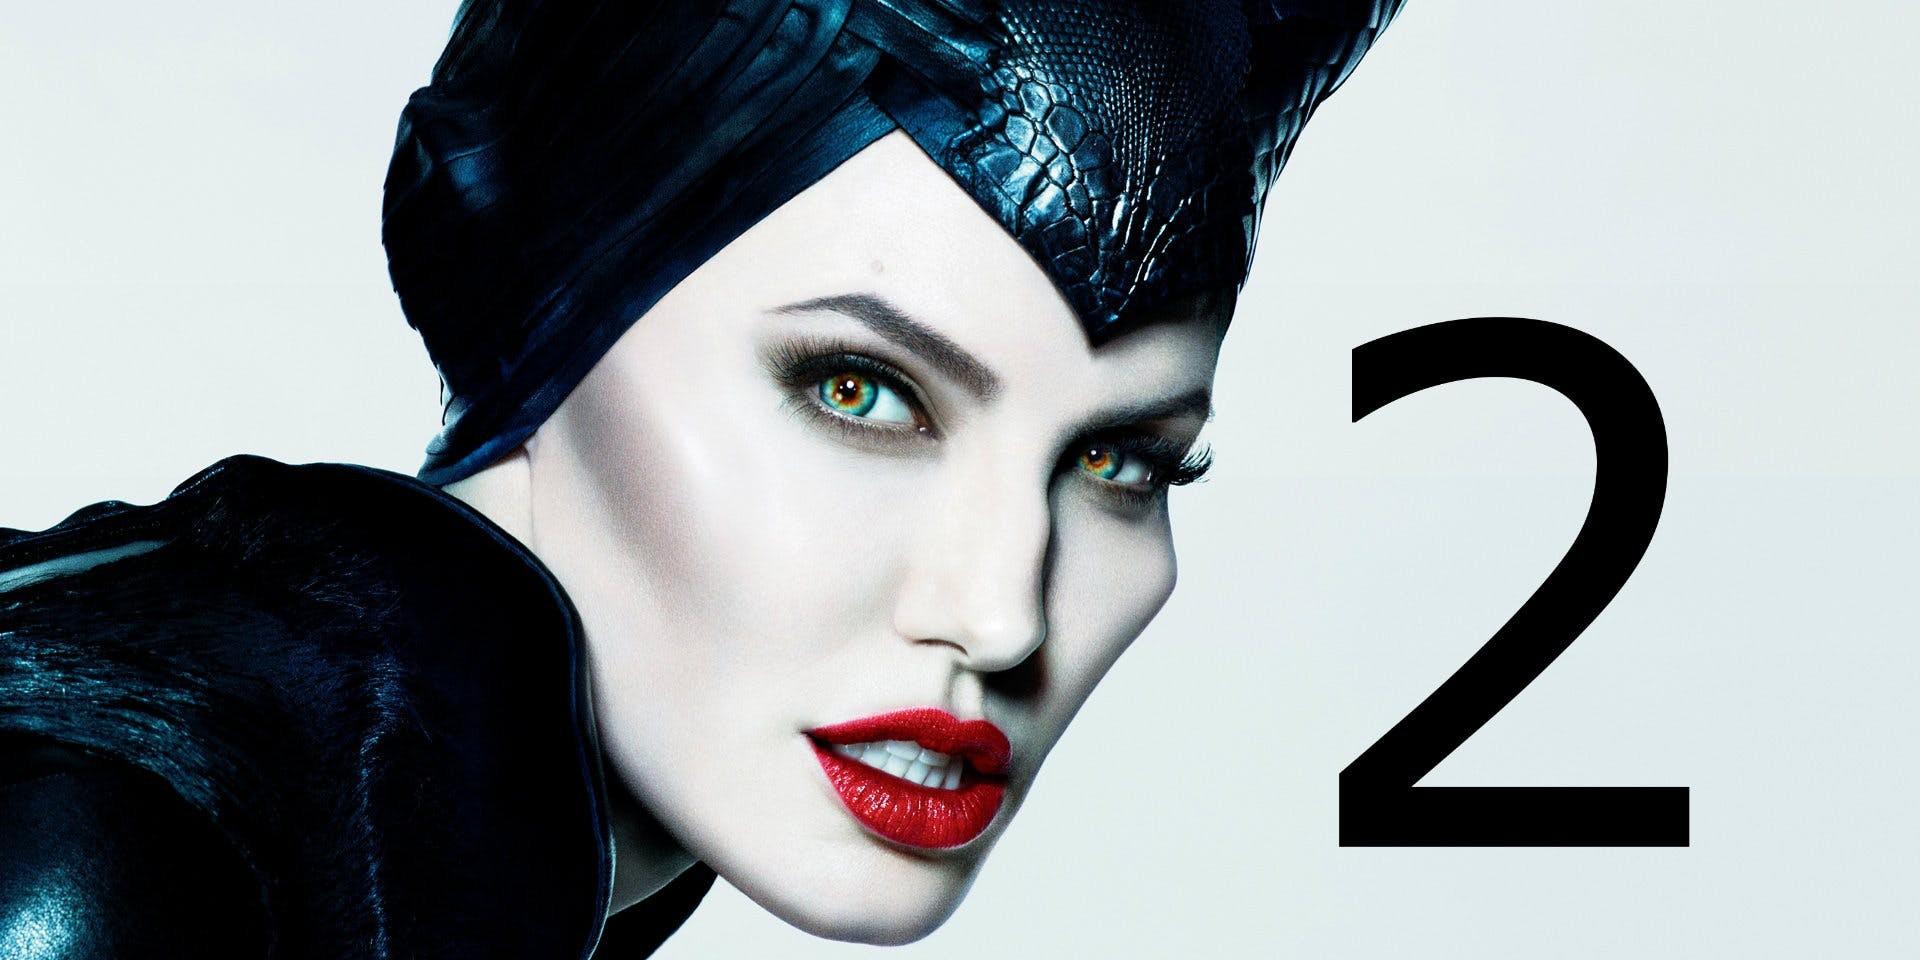 maleficent 2 Film angelina jolie